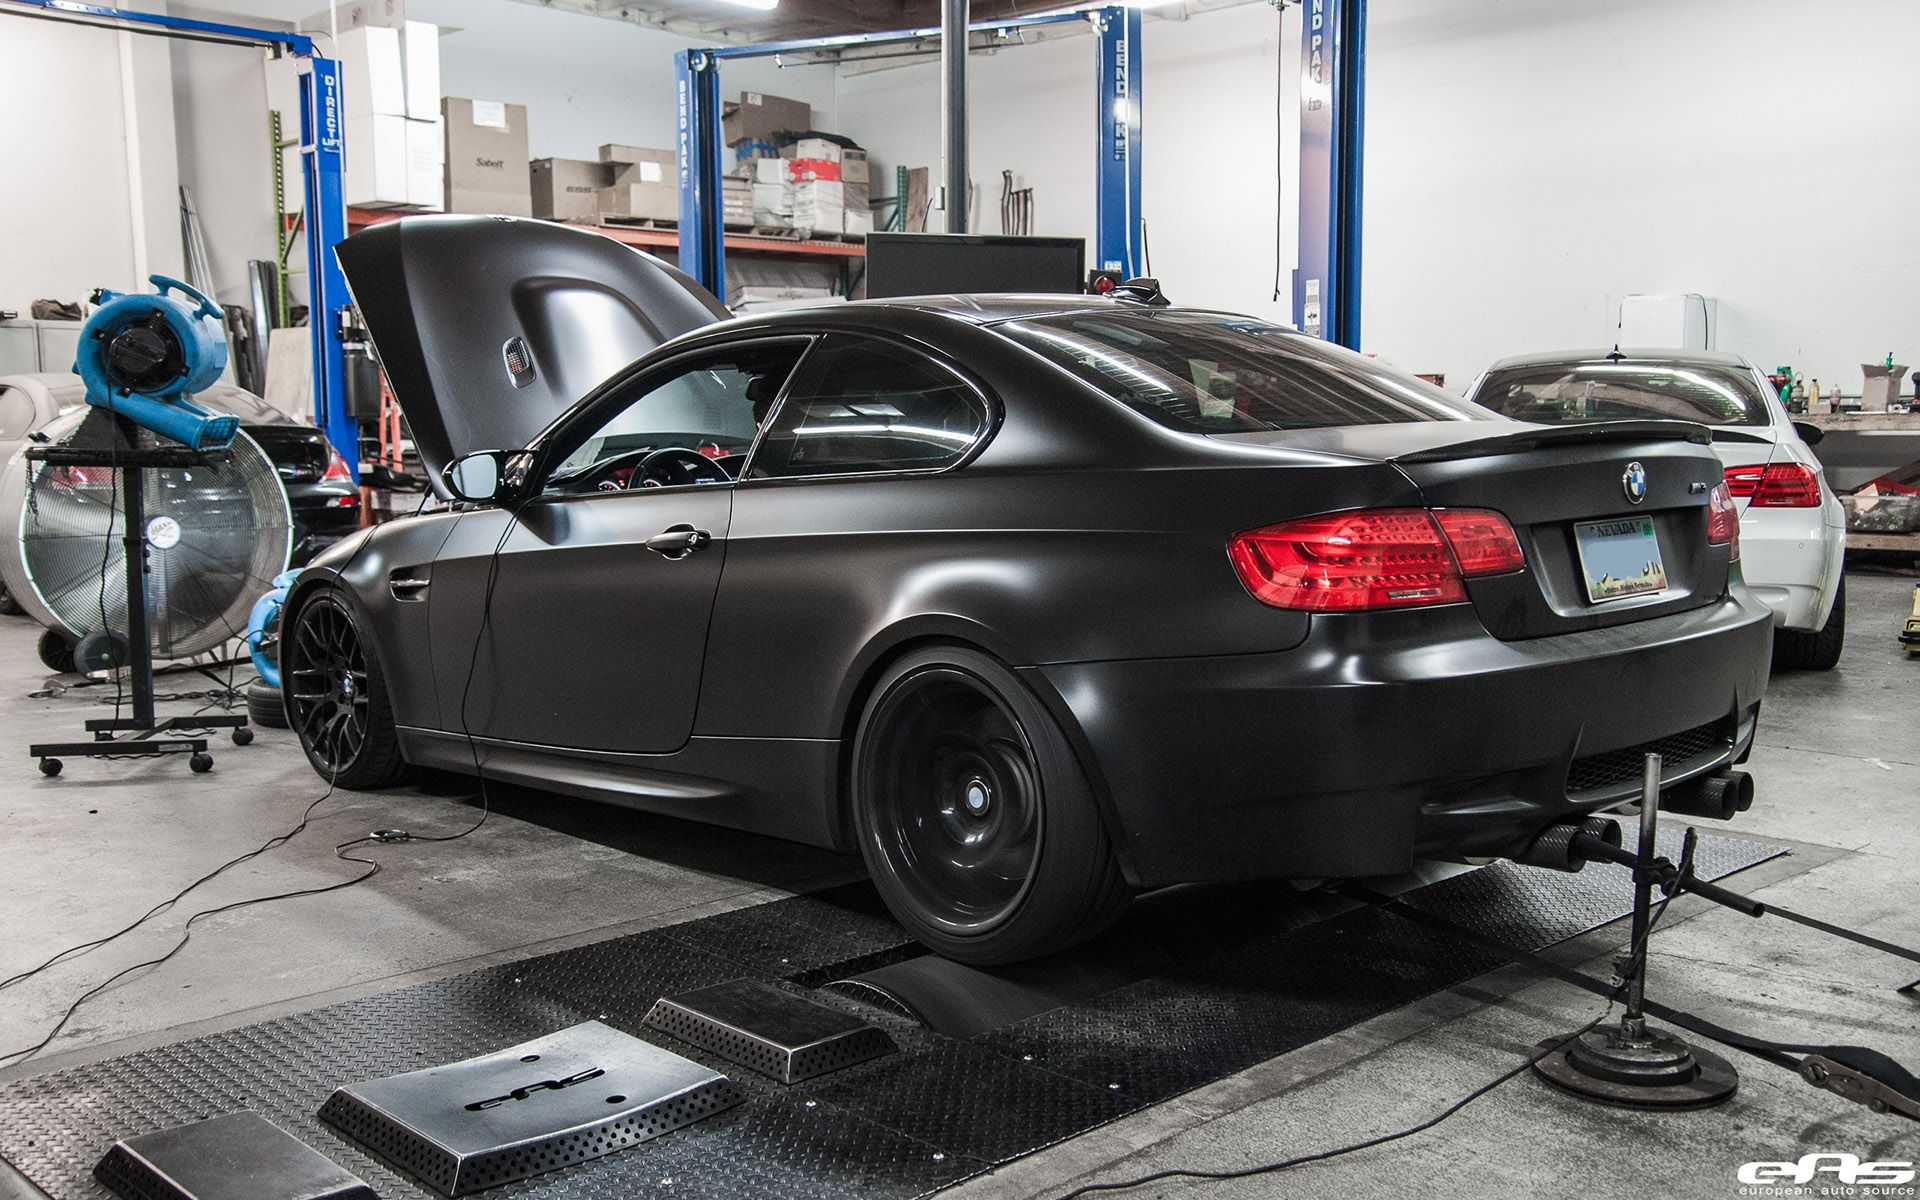 Matte Black Bmw E92 M3 Supercharged Project By European Auto